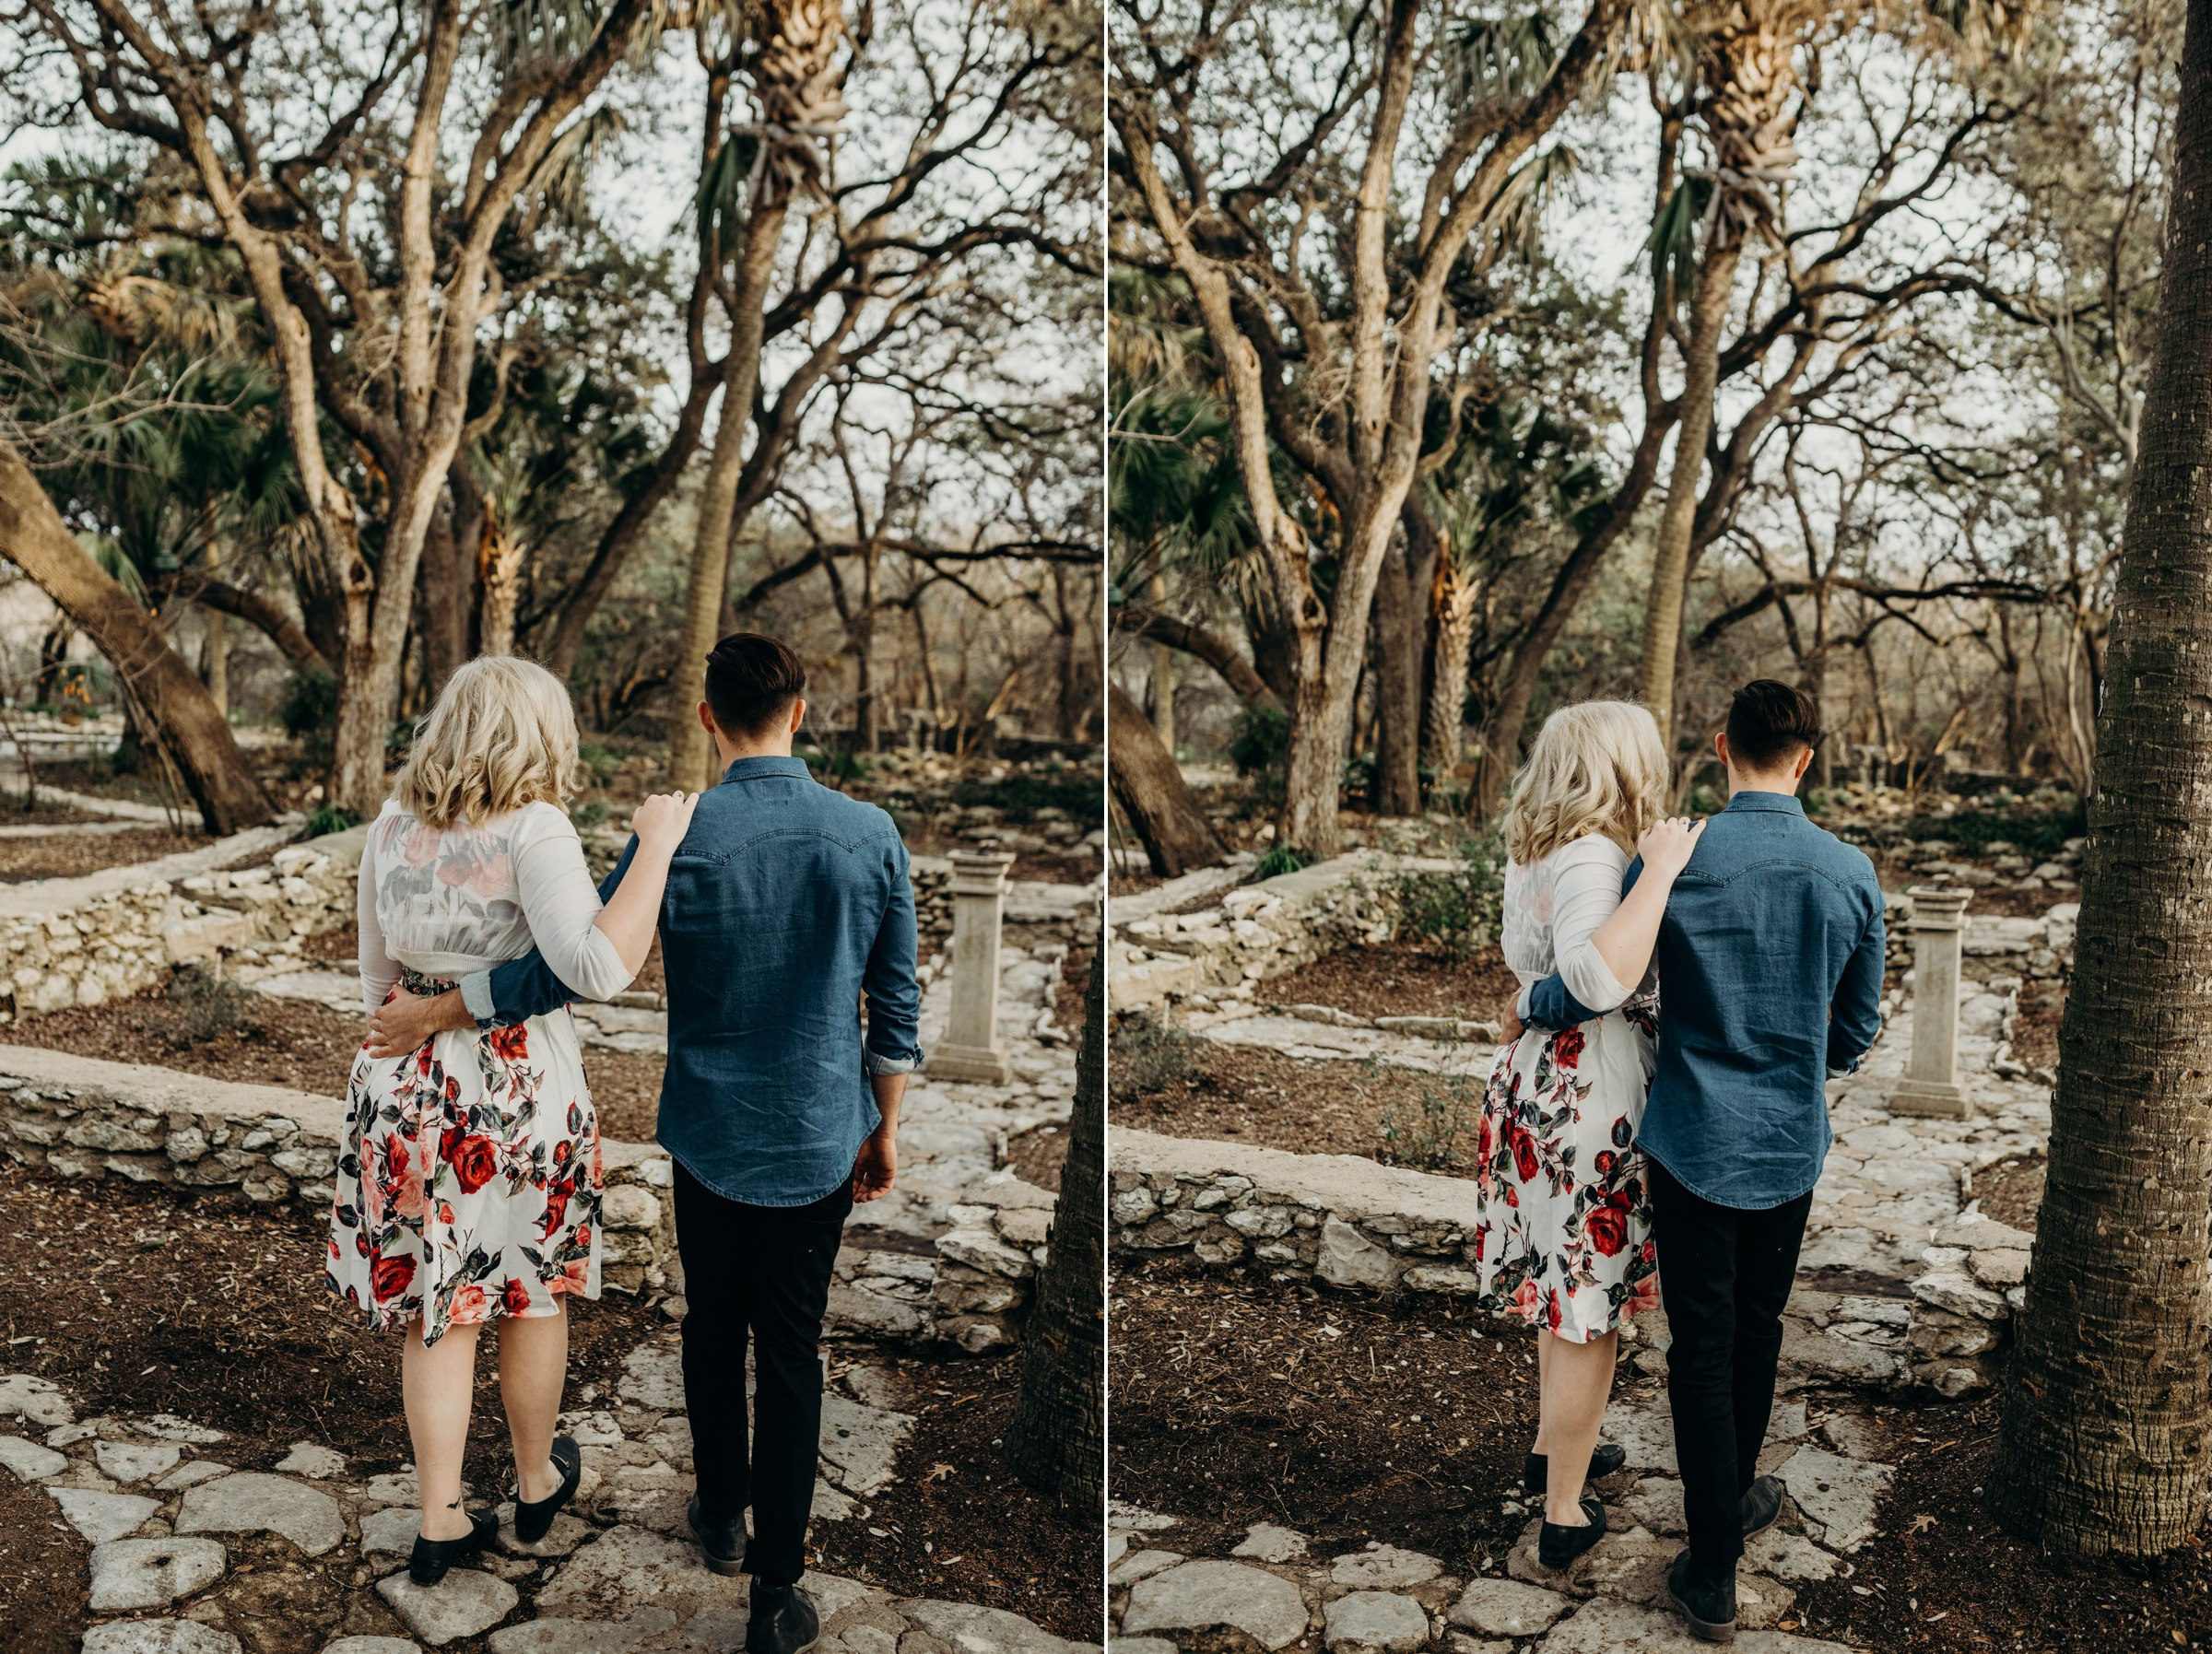 drew-andrew-texas-austin-minnesota-minneapolis-wedding-photographer-destination-elopement-intimate-adventurous_0089.jpg